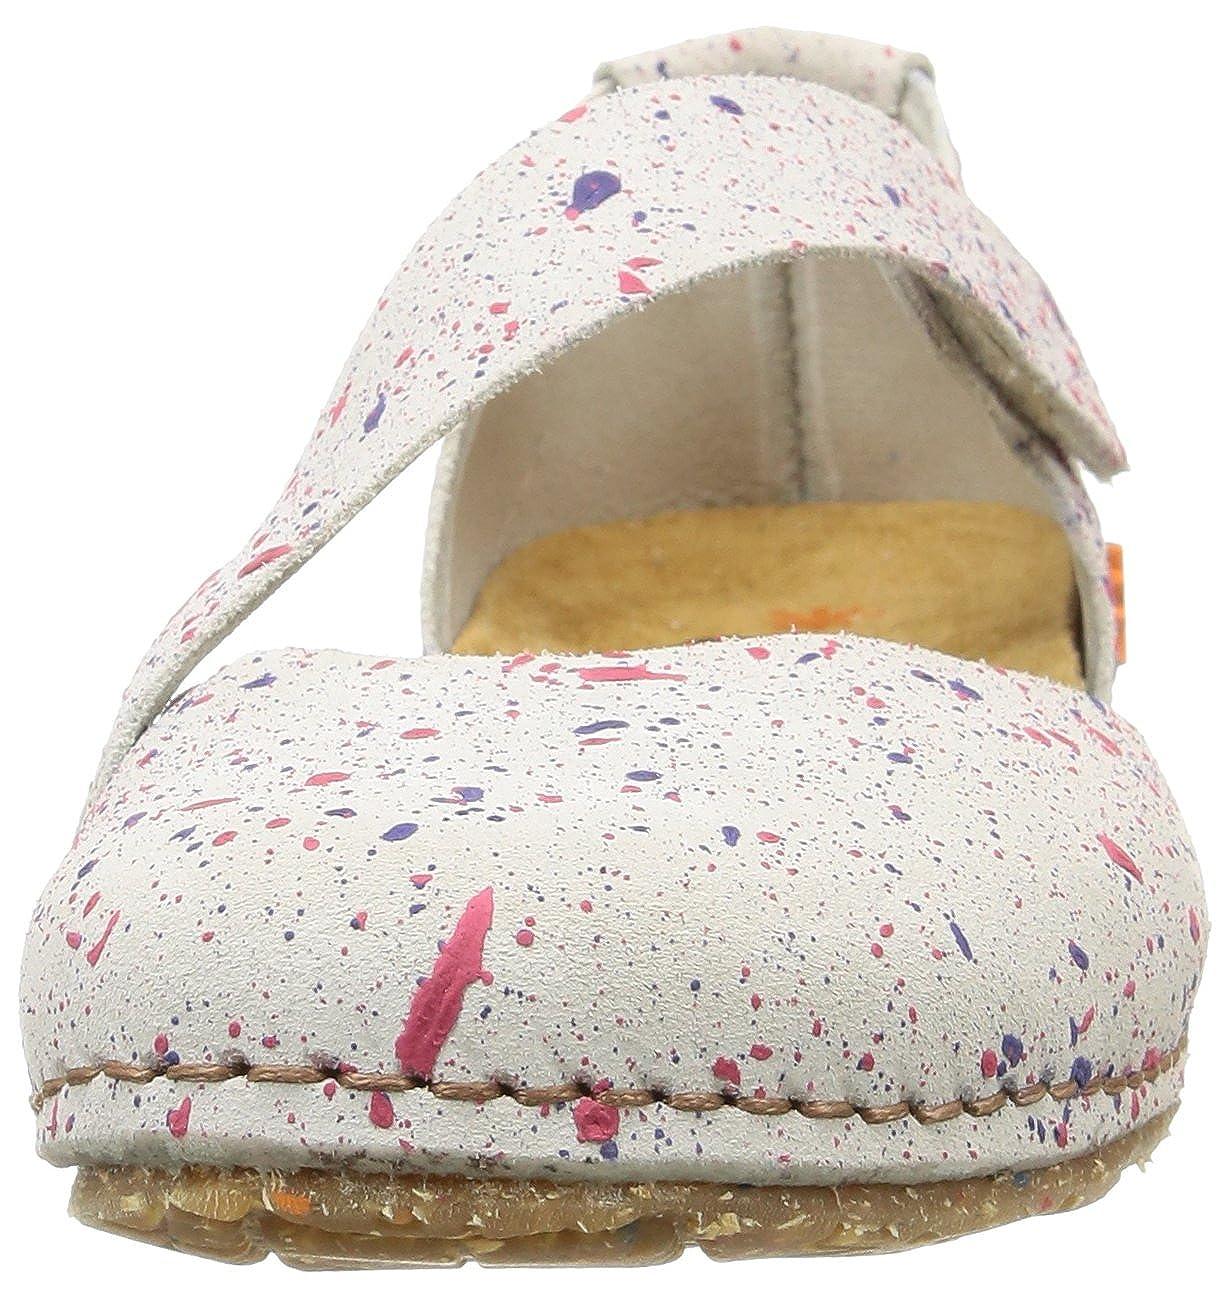 ART Multicolor CRETA Damen Geschlossene Sandalen Multicolor ART (Dotted Weiß) f354e2